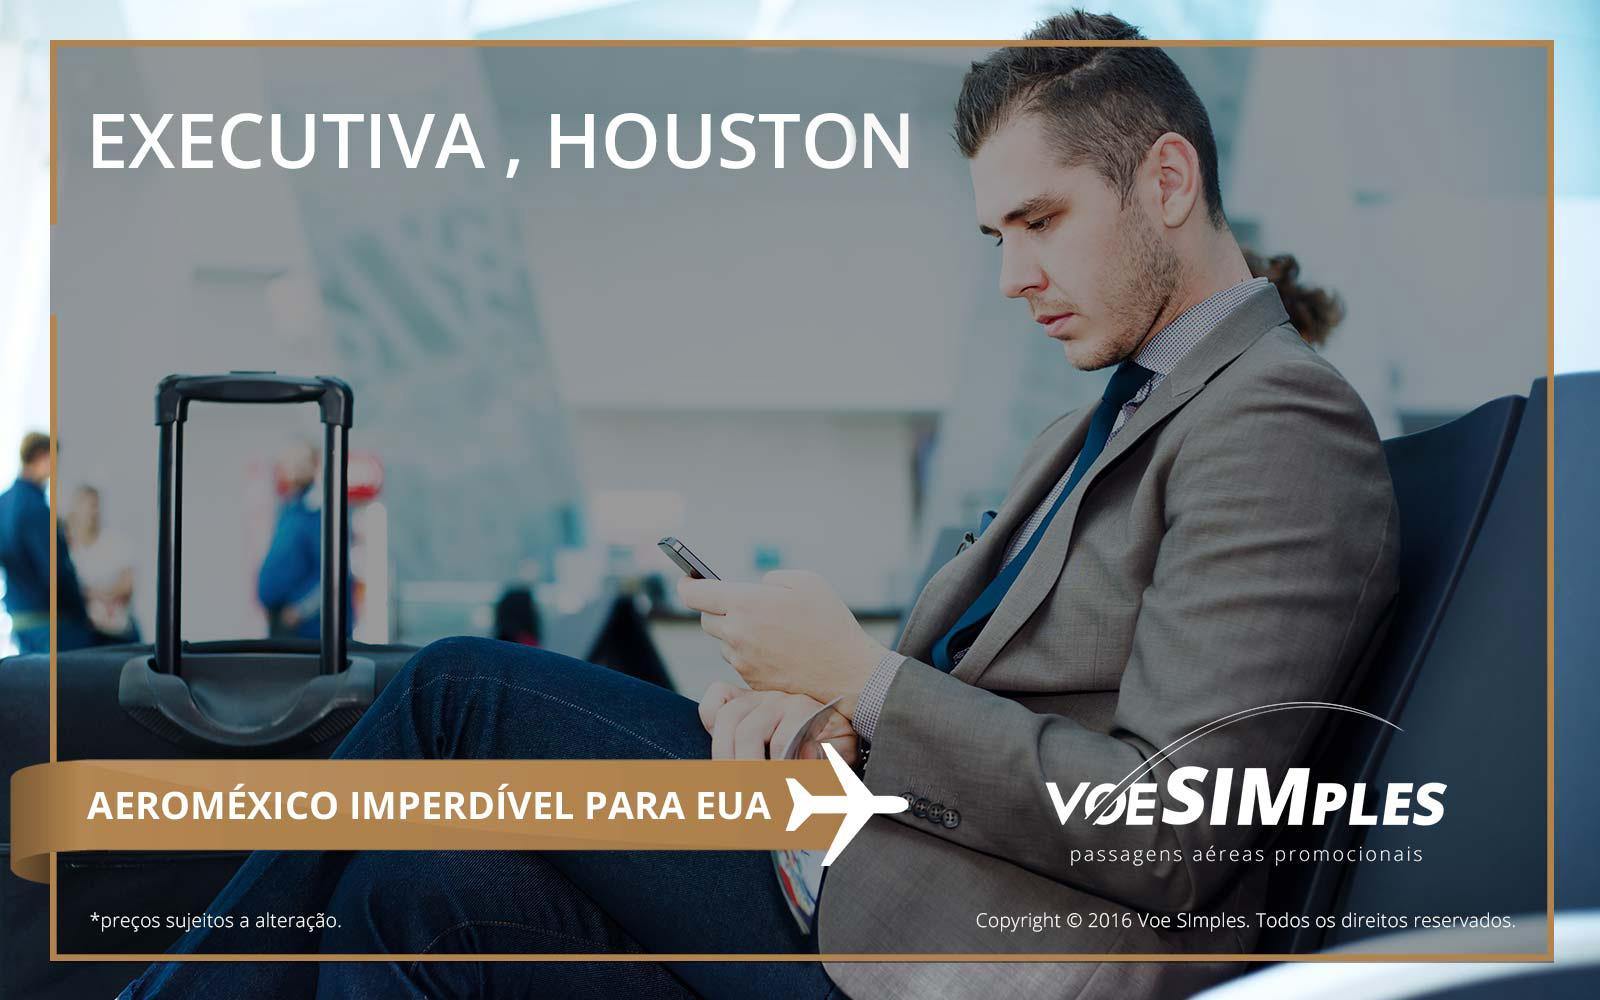 Passagem aérea Classe Executiva Aeroméxico para Houston